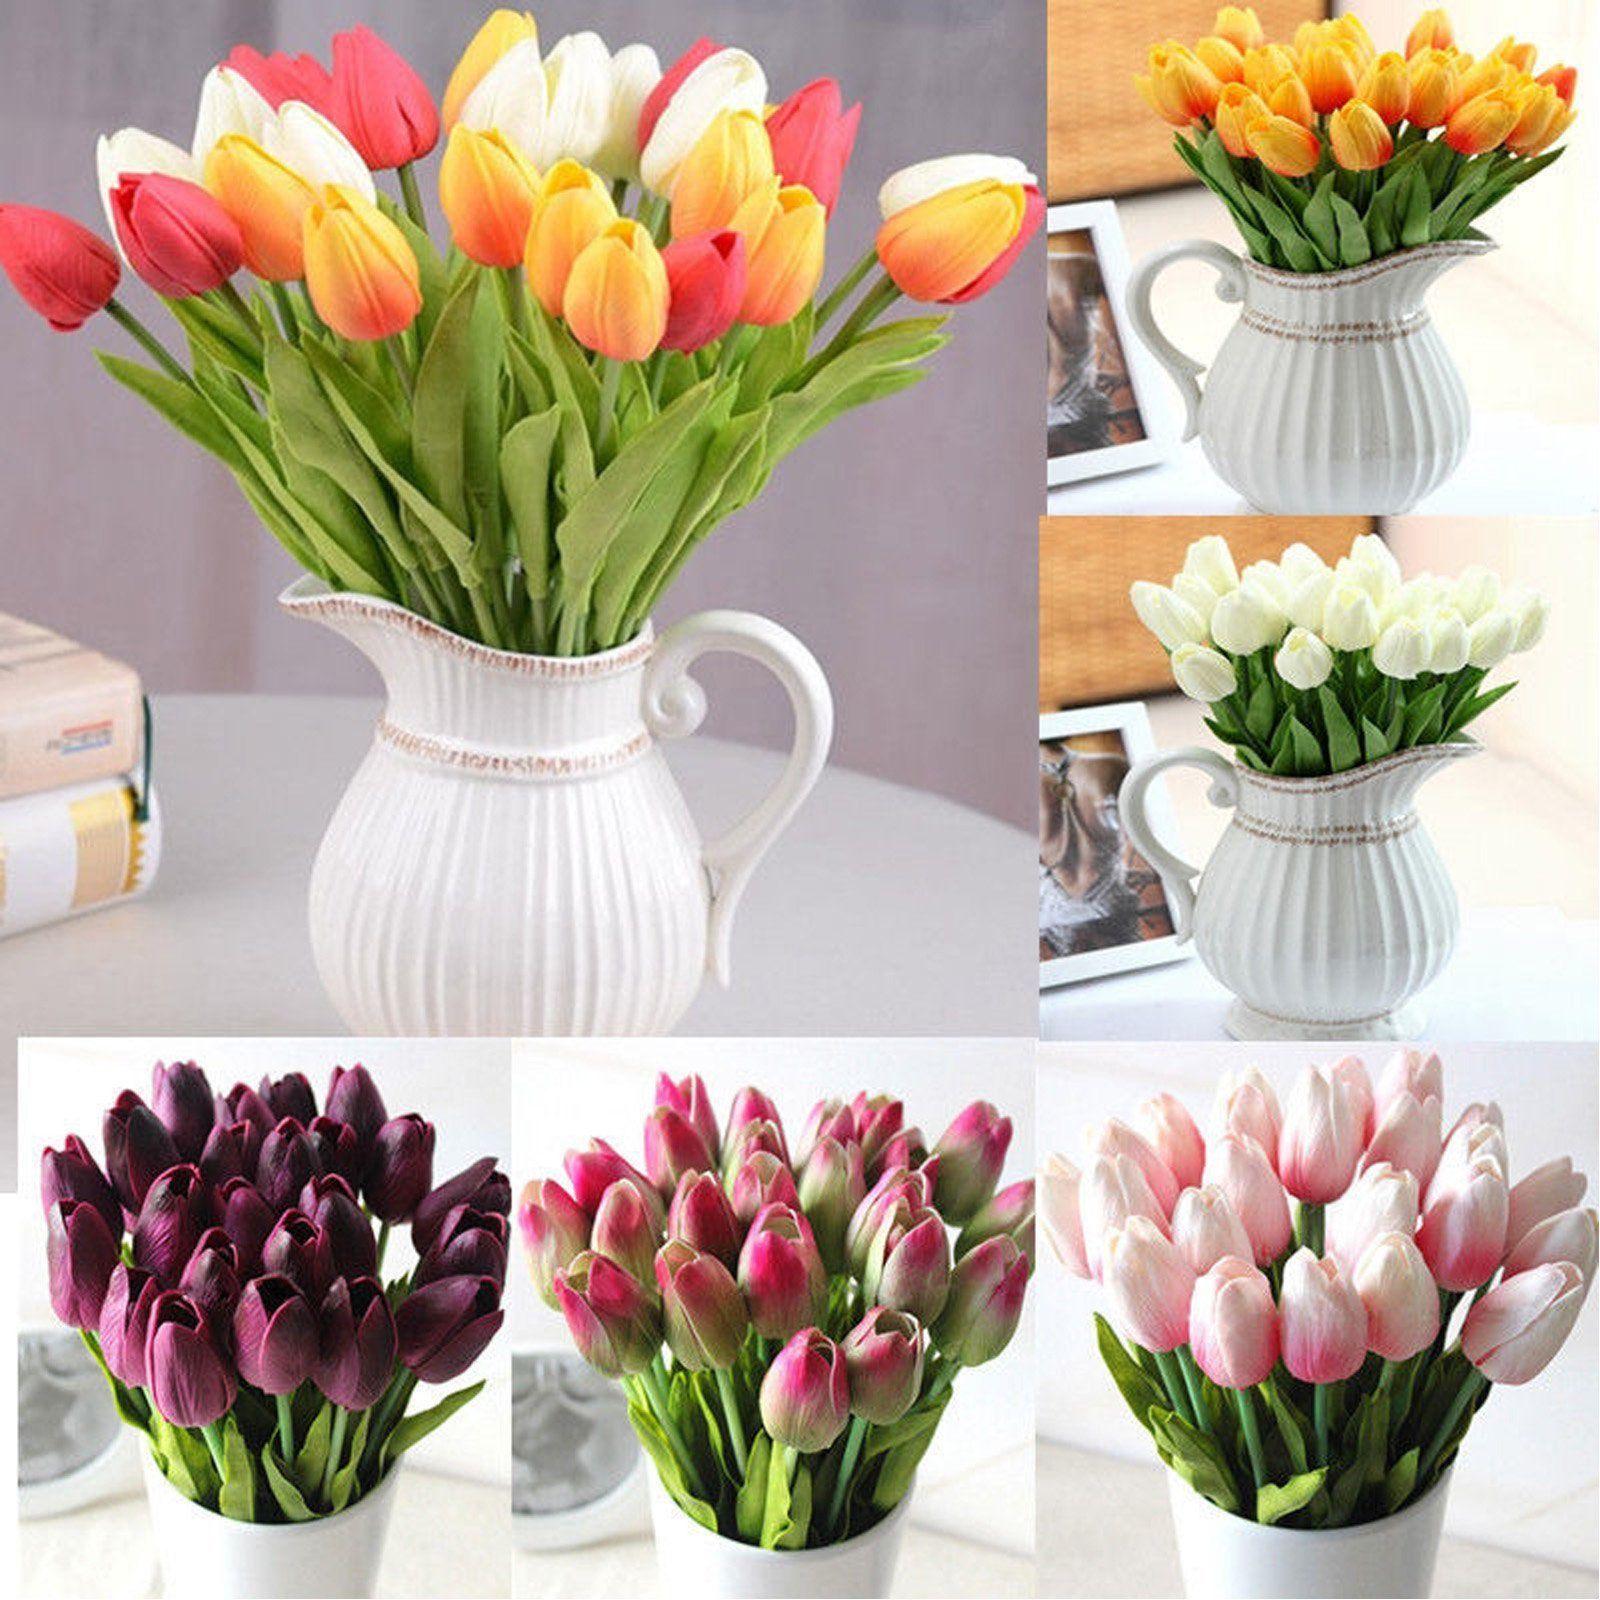 10Pcs Artifical PU White Tulips Flower Single Stem Bouquet